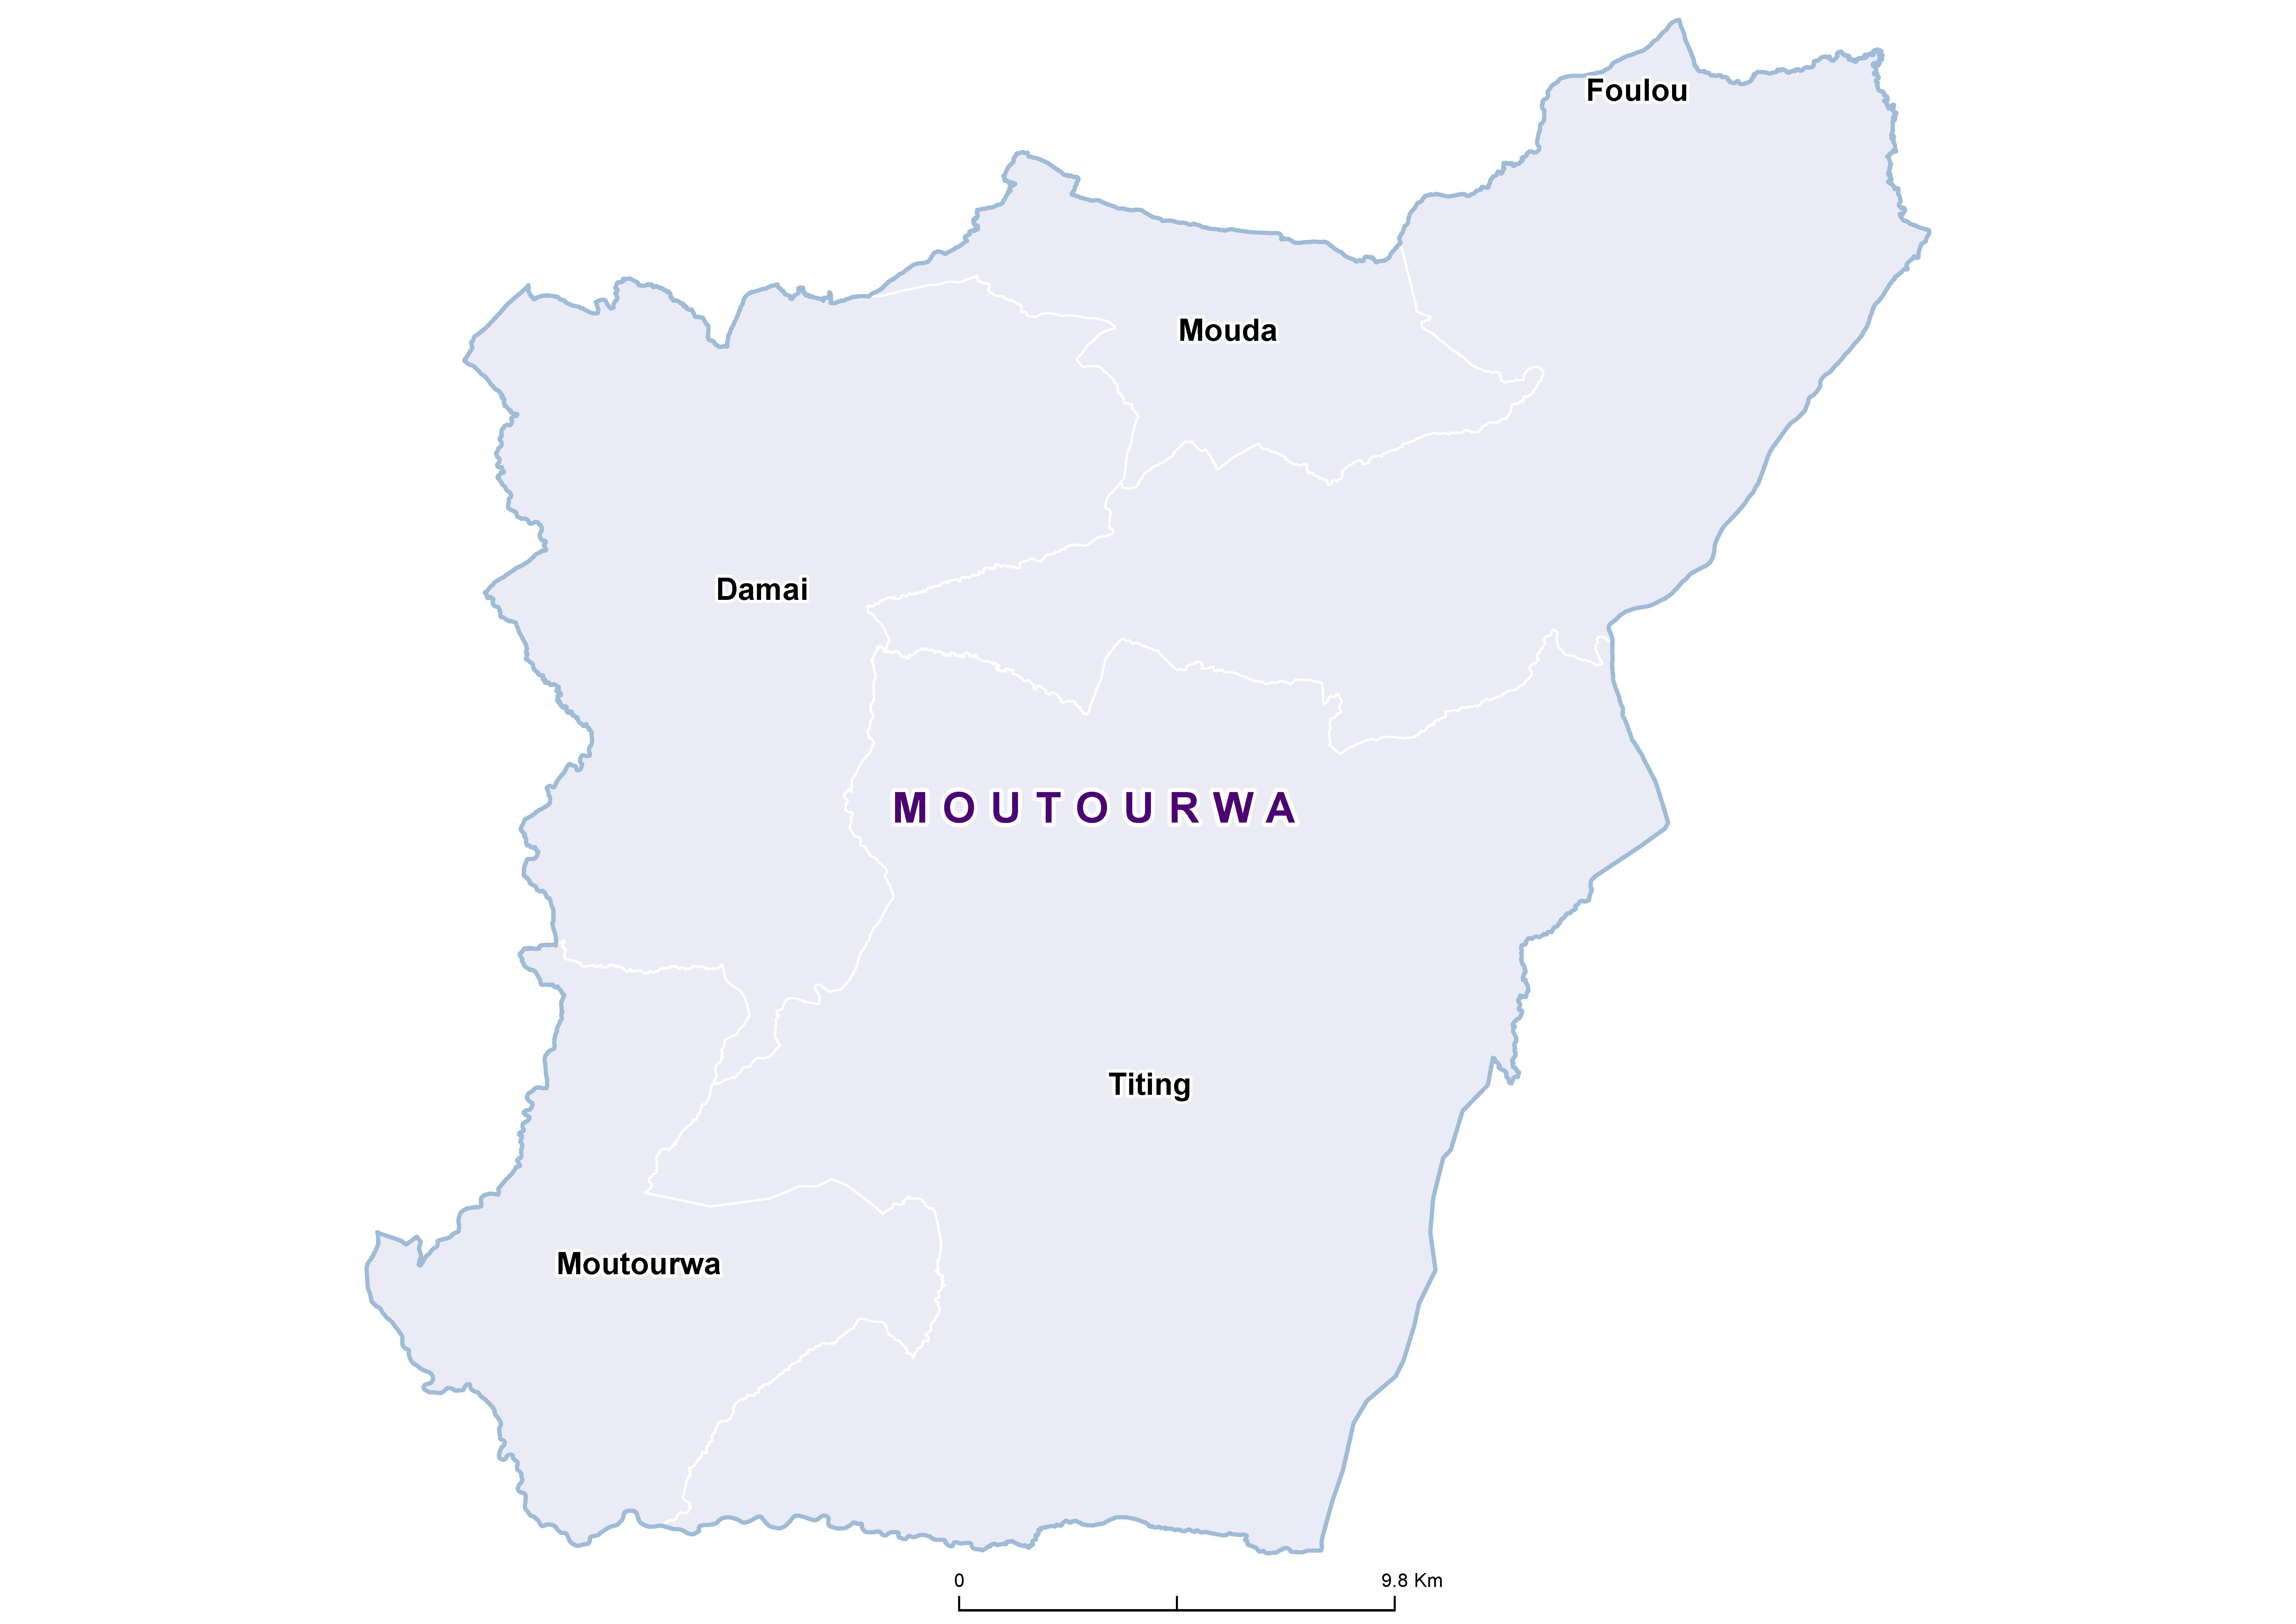 Moutourwa STH 19850001